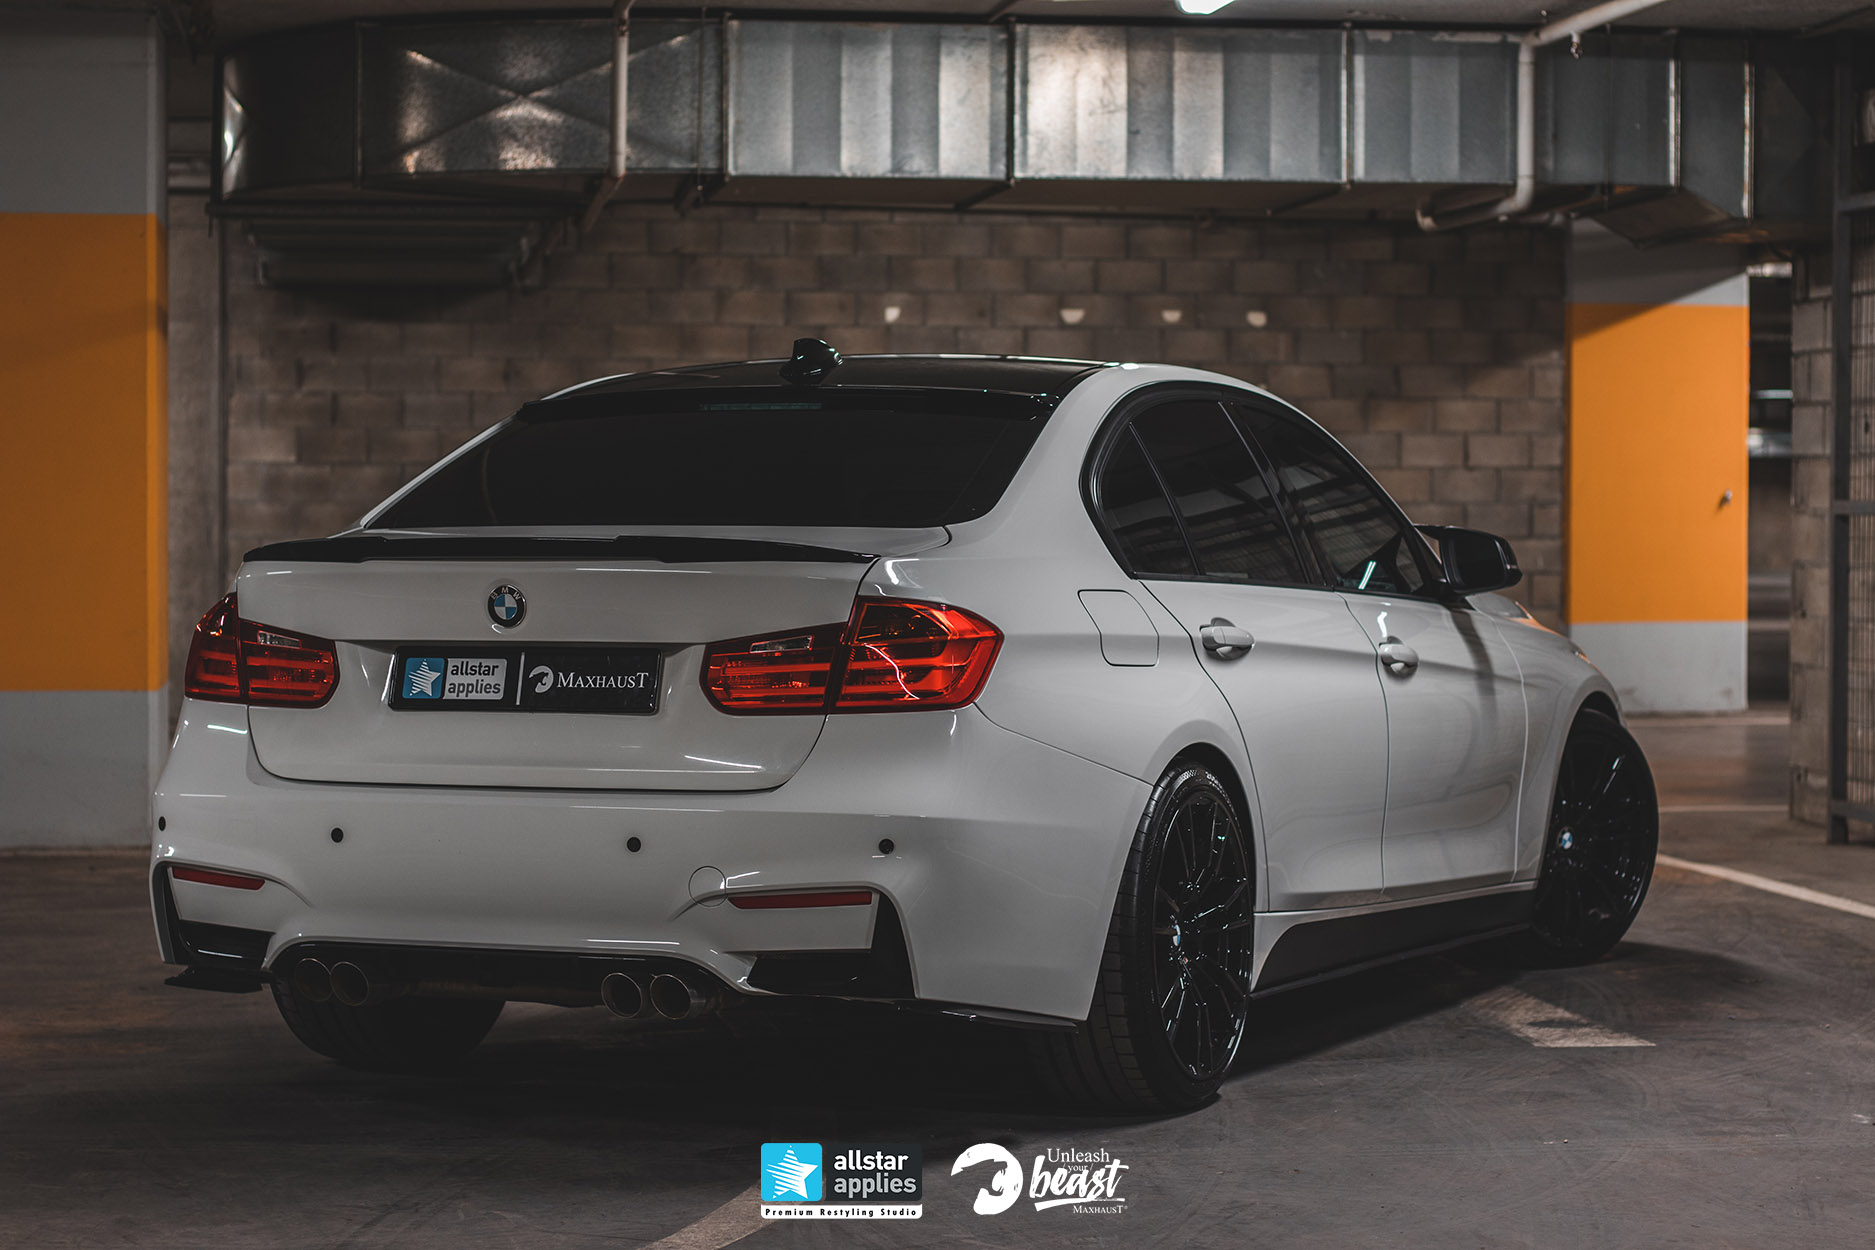 BMW 3 SERIES MAXHAUST 4